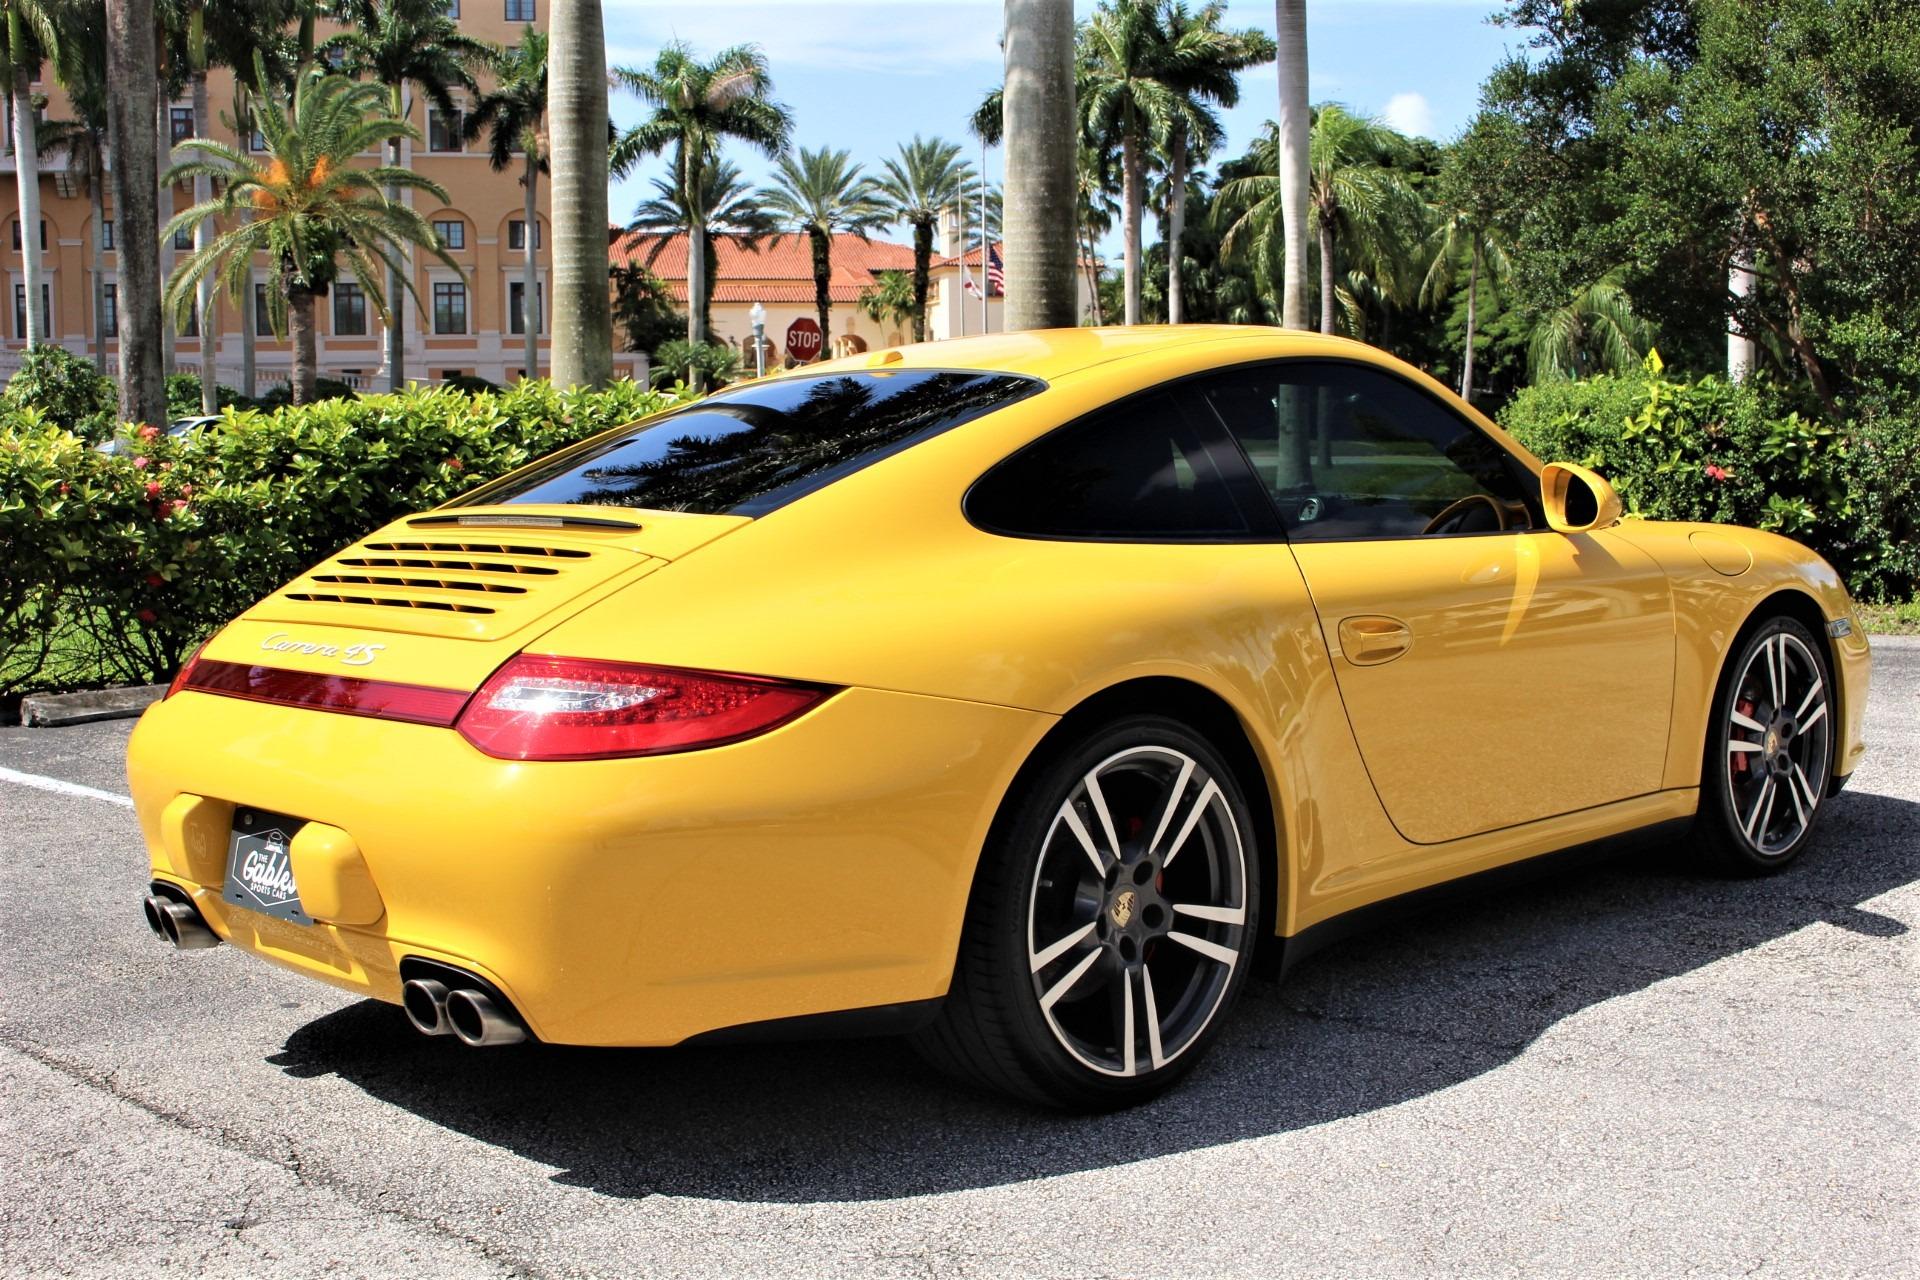 Used 2011 Porsche 911 Carrera 4S for sale $79,850 at The Gables Sports Cars in Miami FL 33146 3